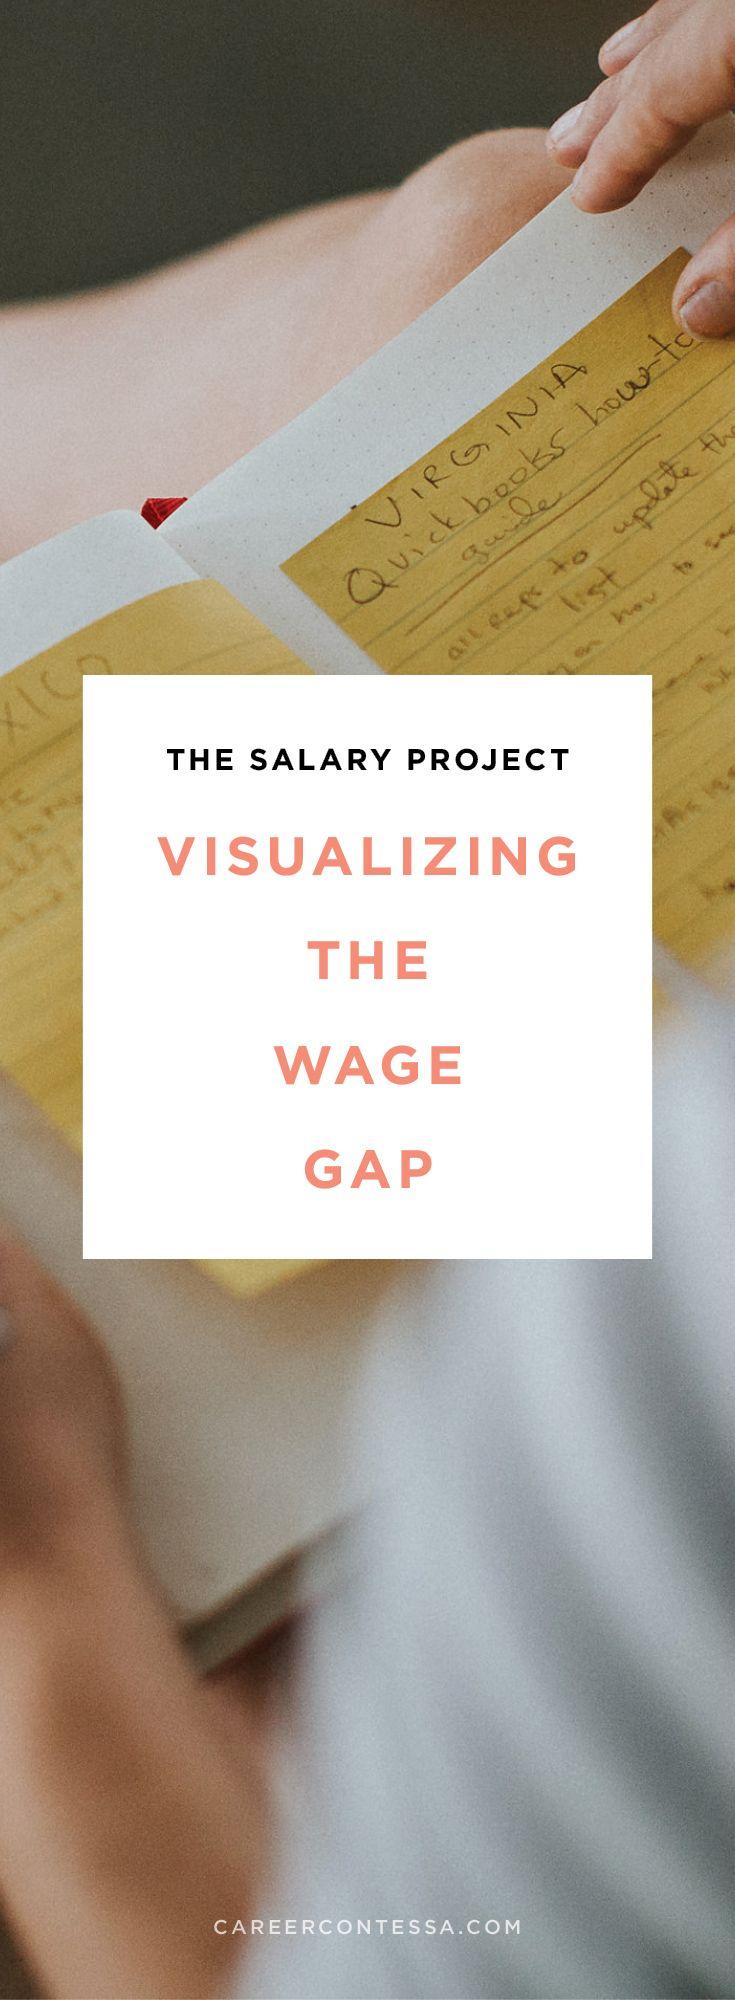 Salary Project Career Contessa Wage Gap Career Contessa Negotiating Salary